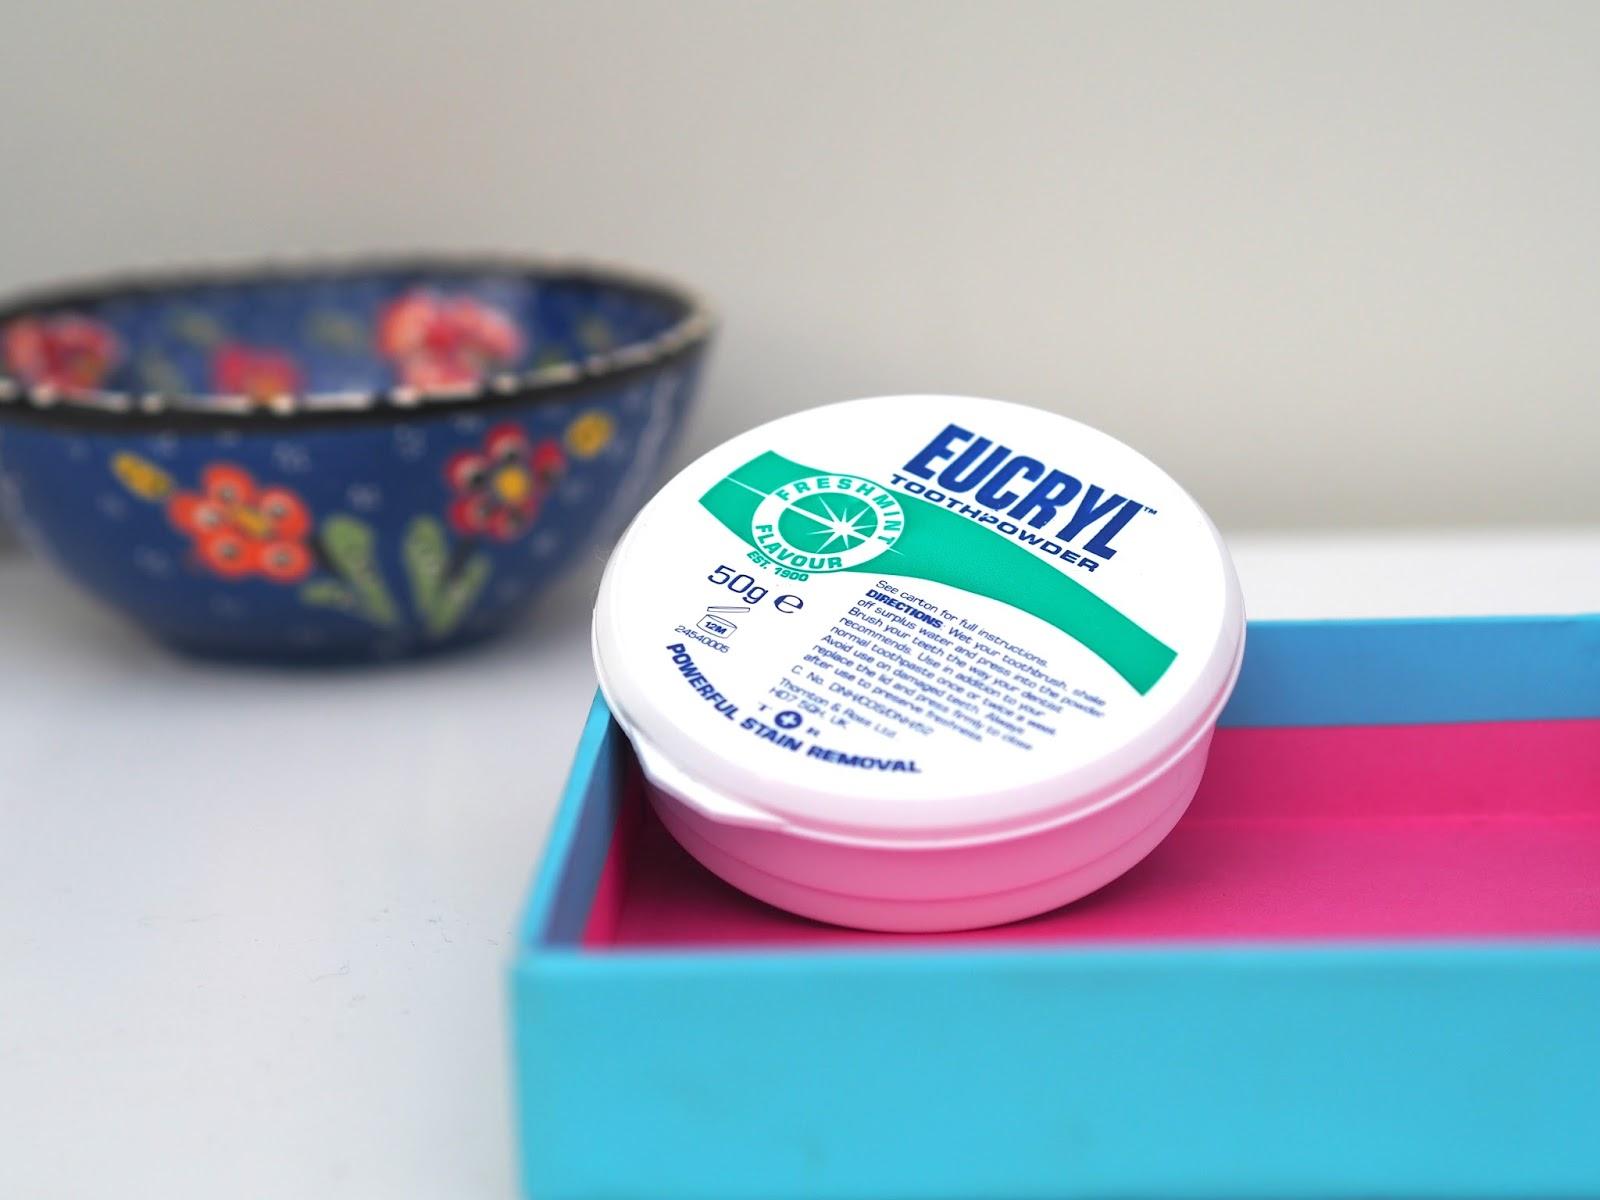 eucryl toothpowder